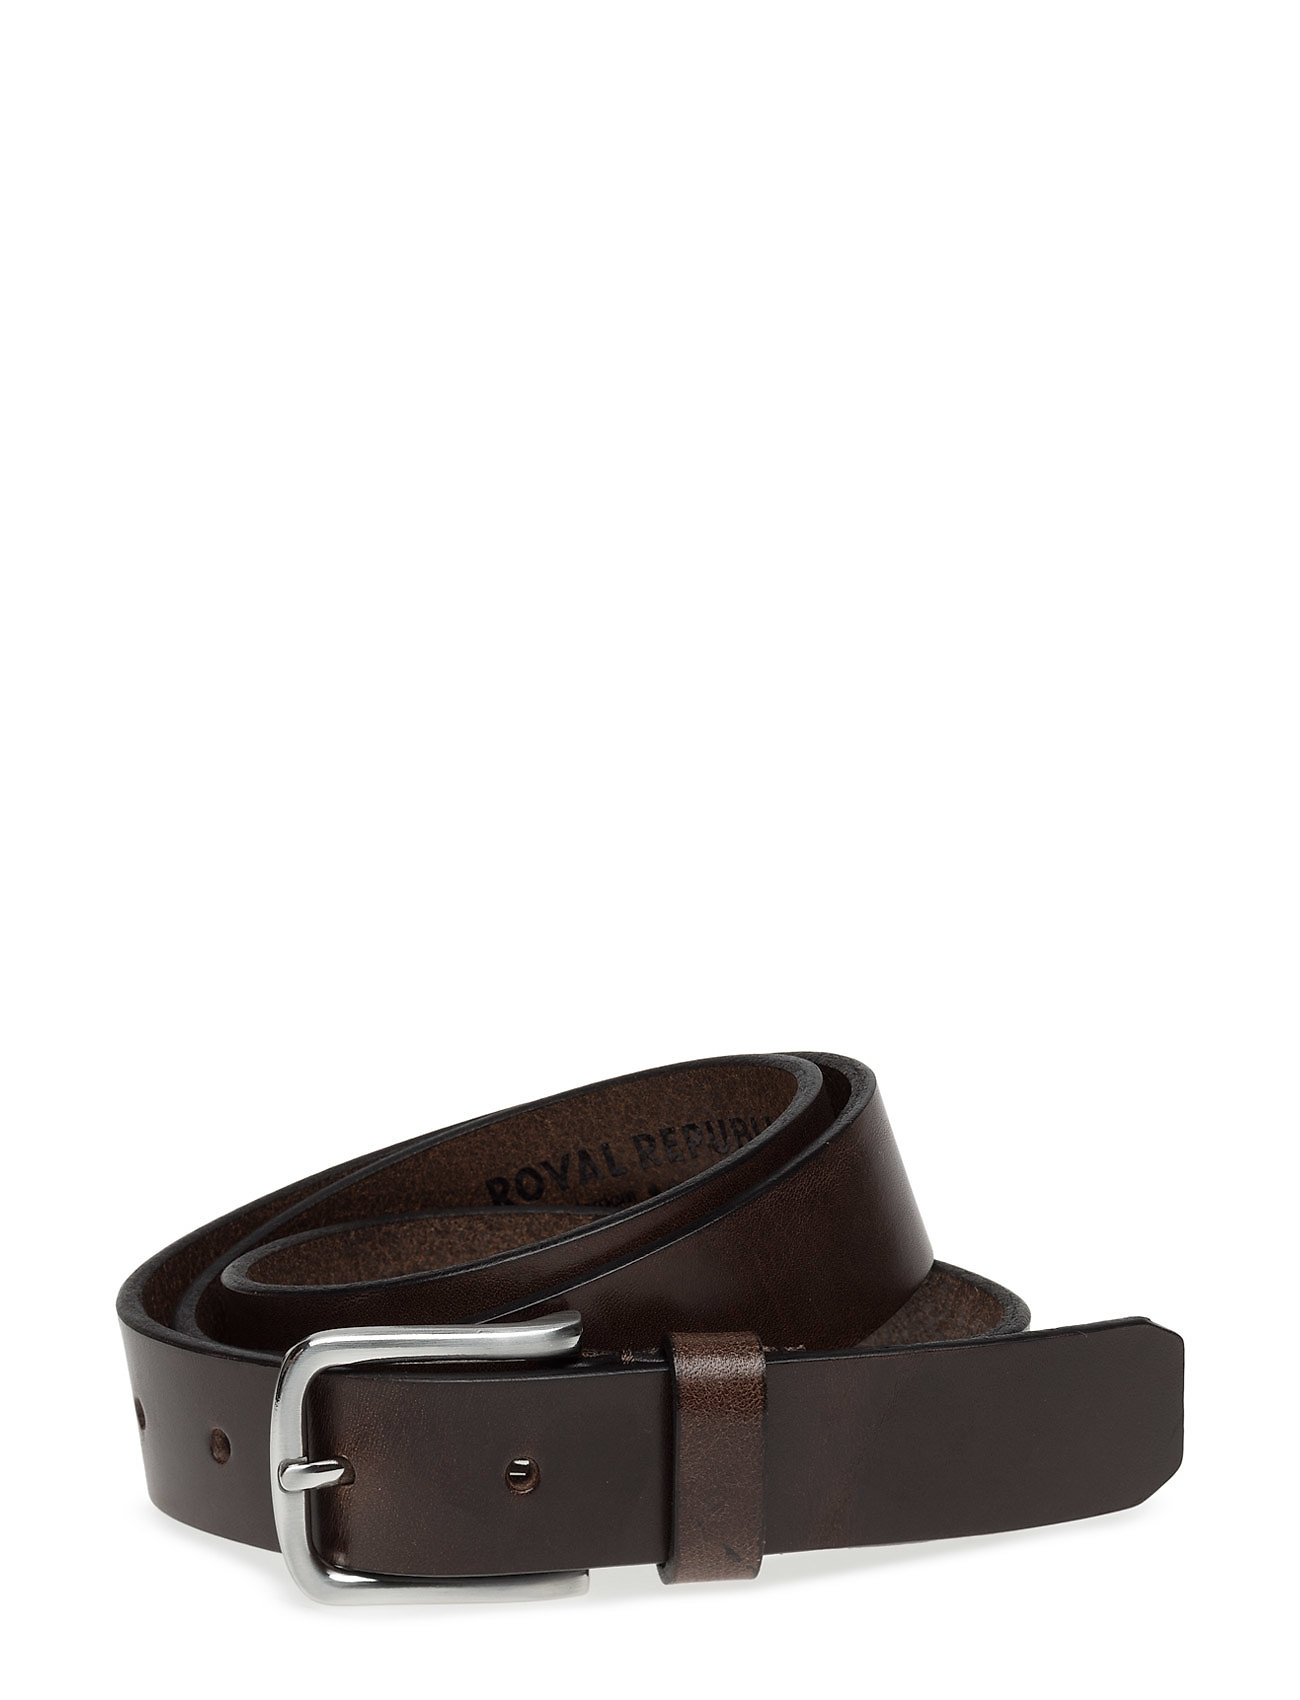 Miniature Belt Royal RepubliQ Bælter til Damer i Brun